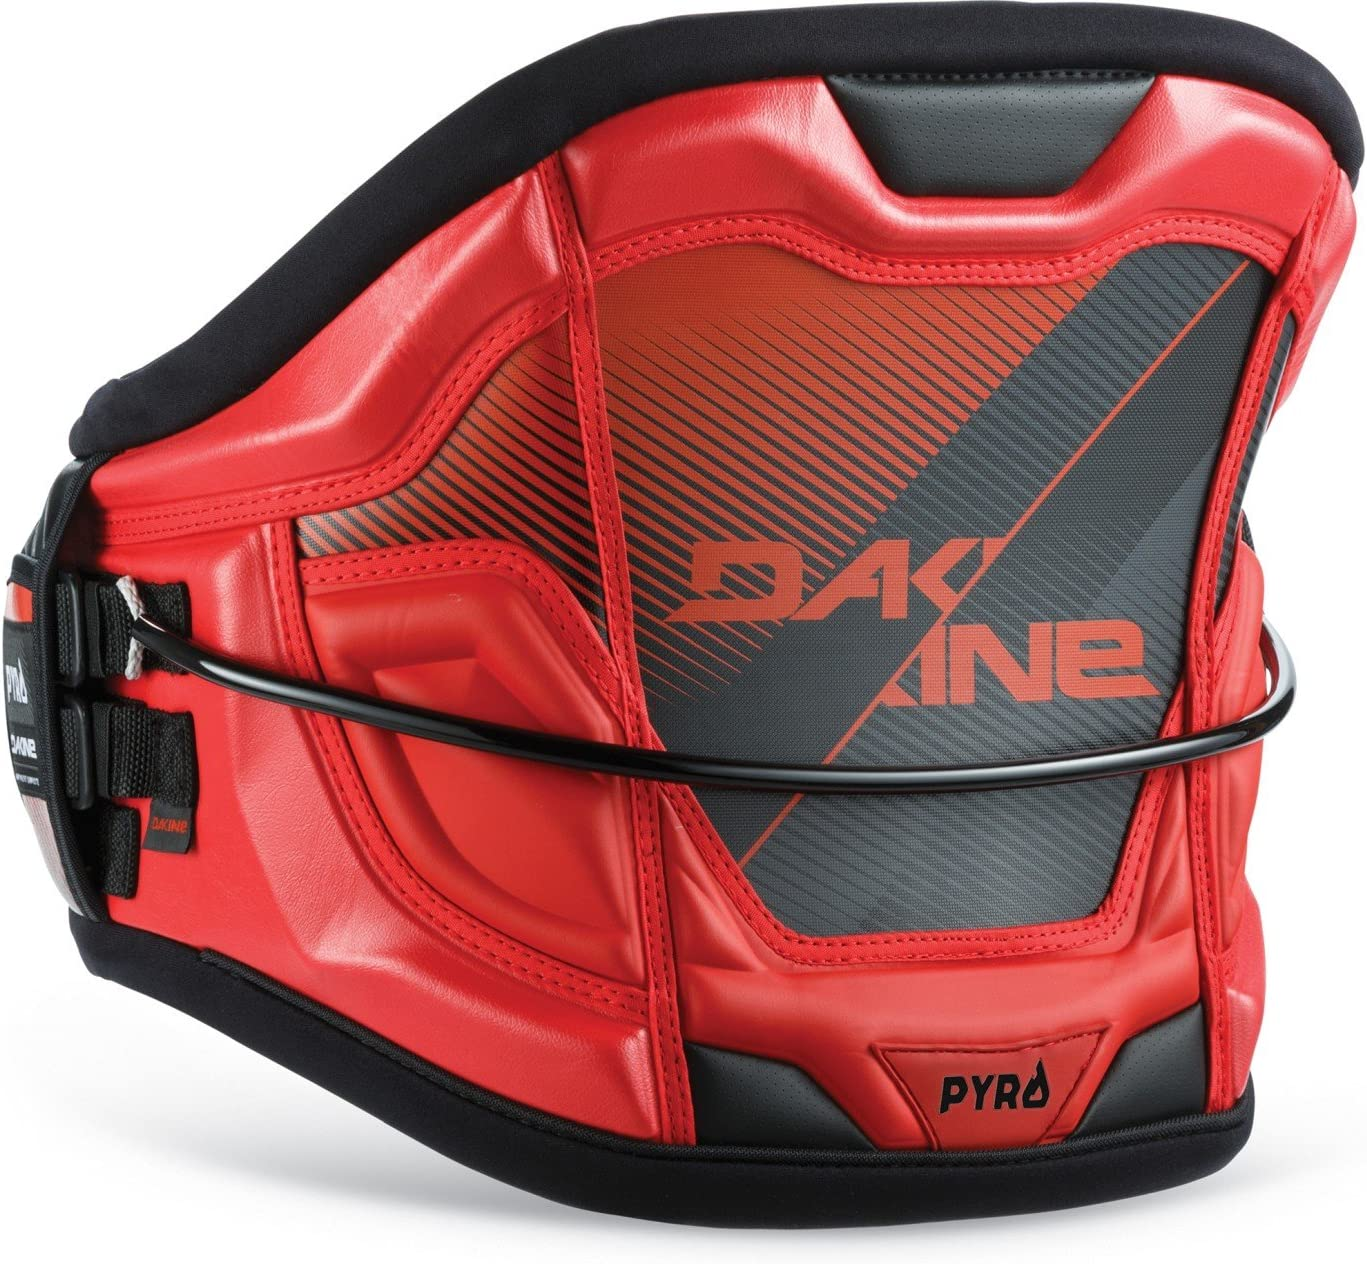 Sale price Dakine Men's Pyro Reservation Kiteboard Red XS Harness